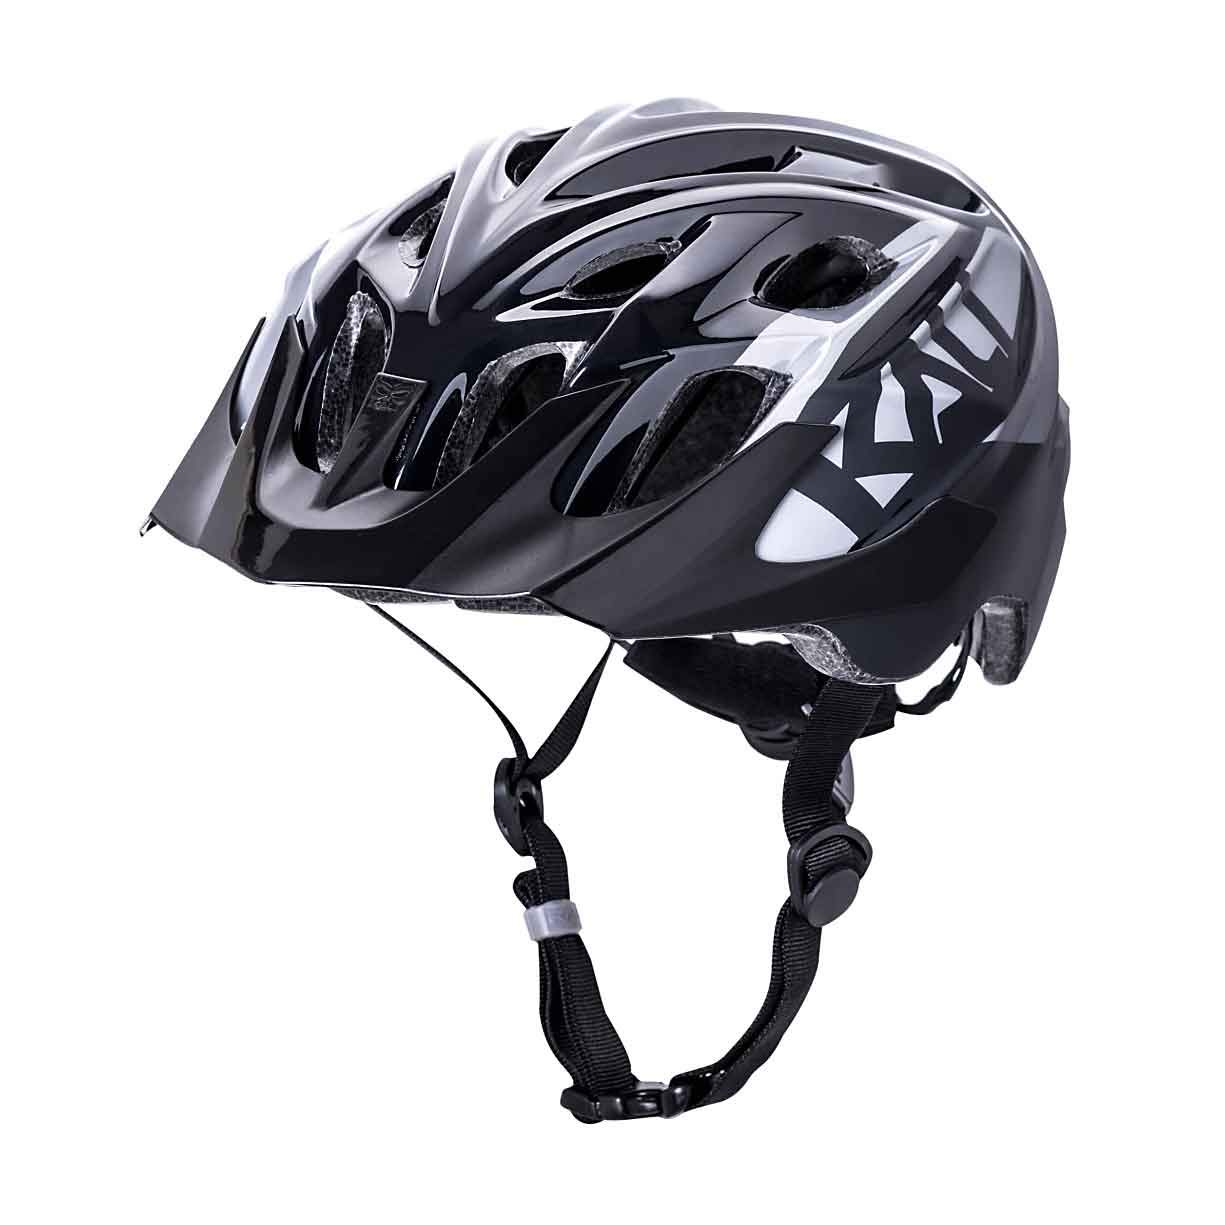 Kali Protectives Chakra Youth Helmet - Kids' Snap Gls Black/Grey, One Size